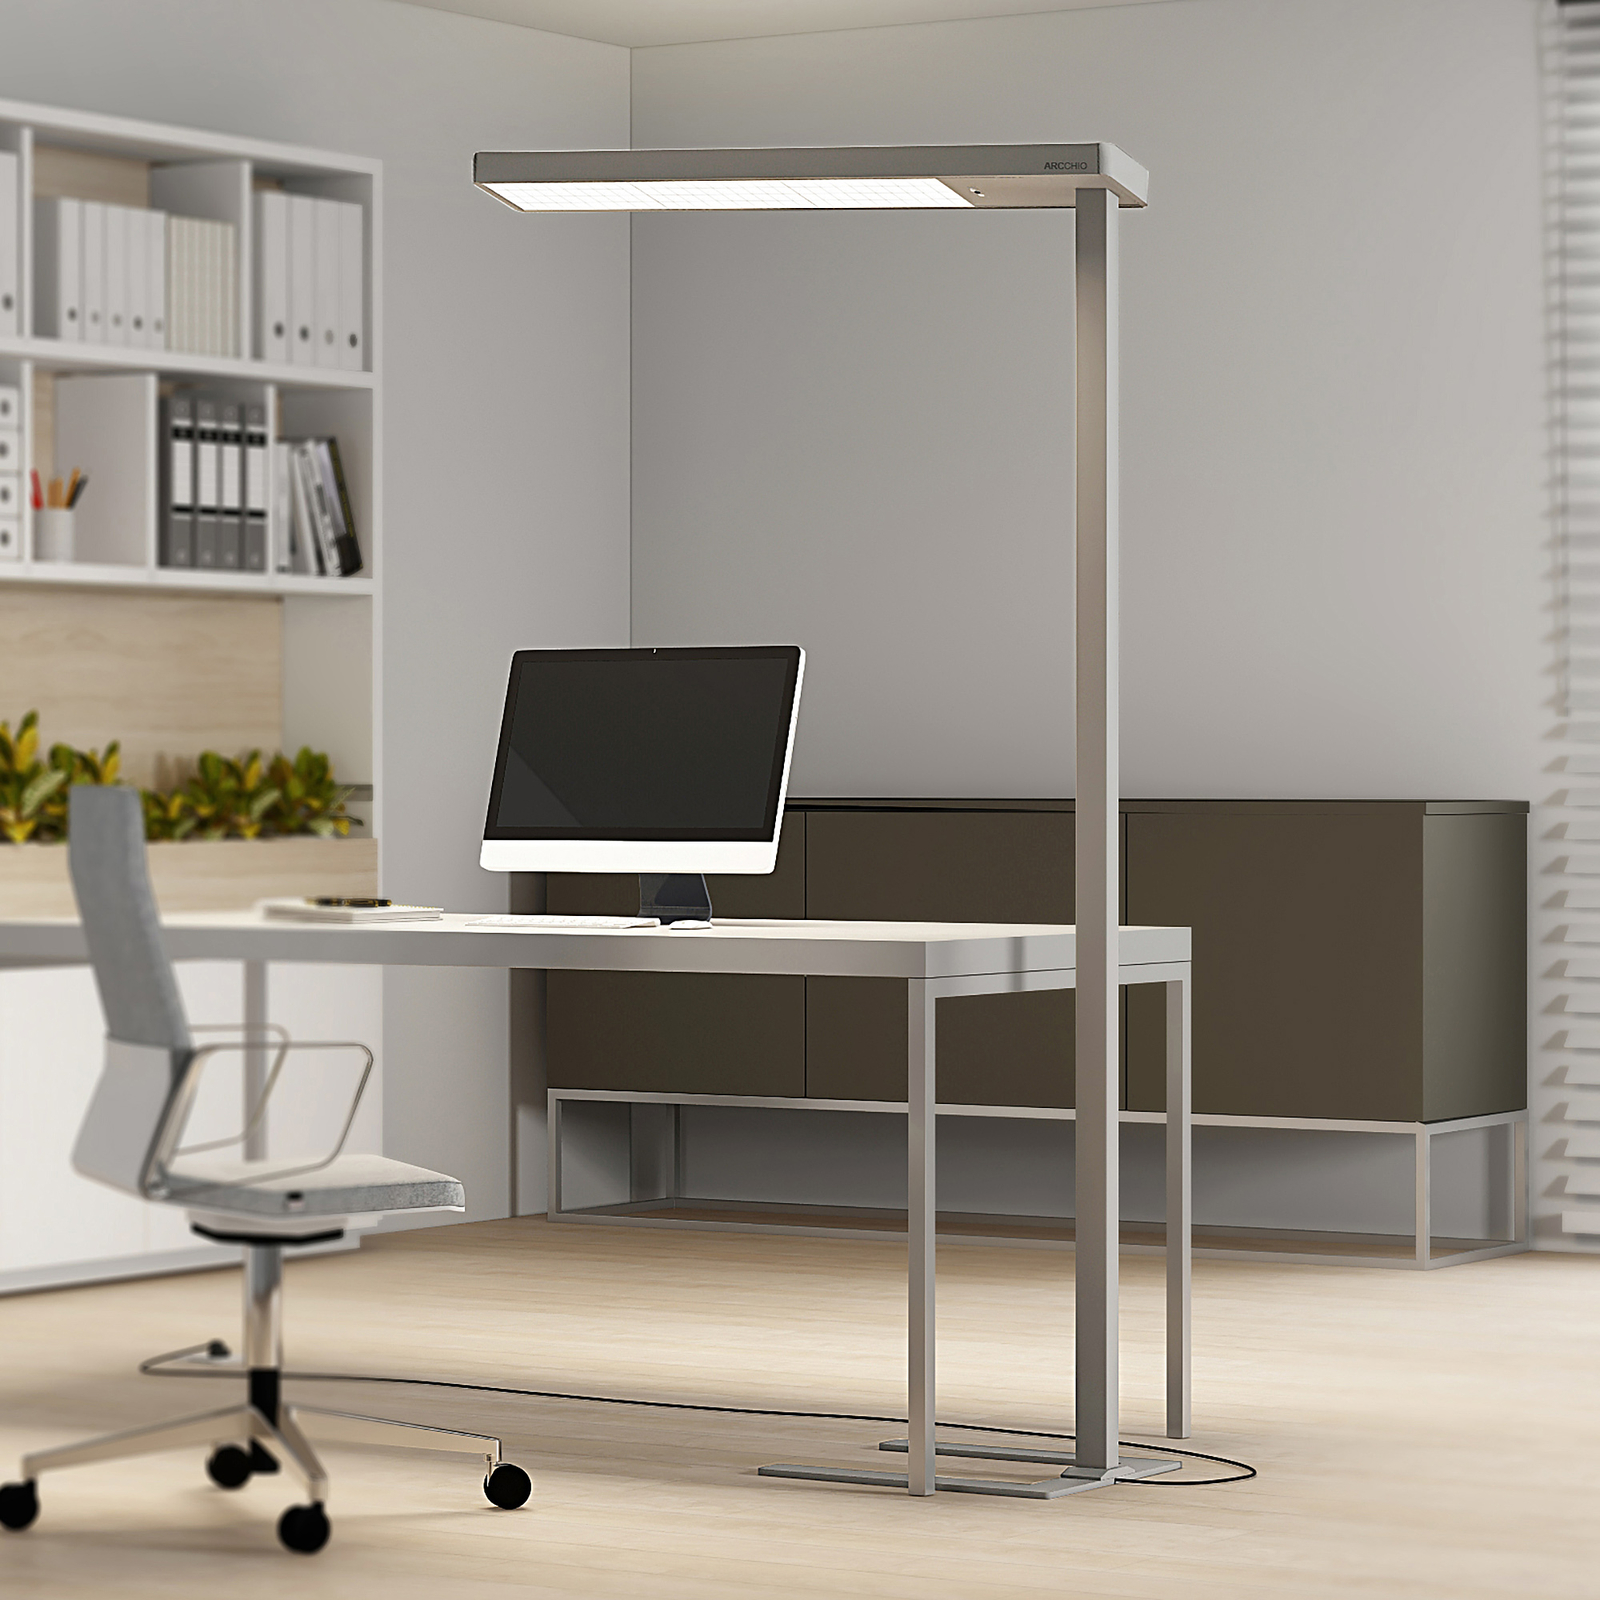 Arcchio Bilano-LED-lattiavalo päivänvaloanturi CCT